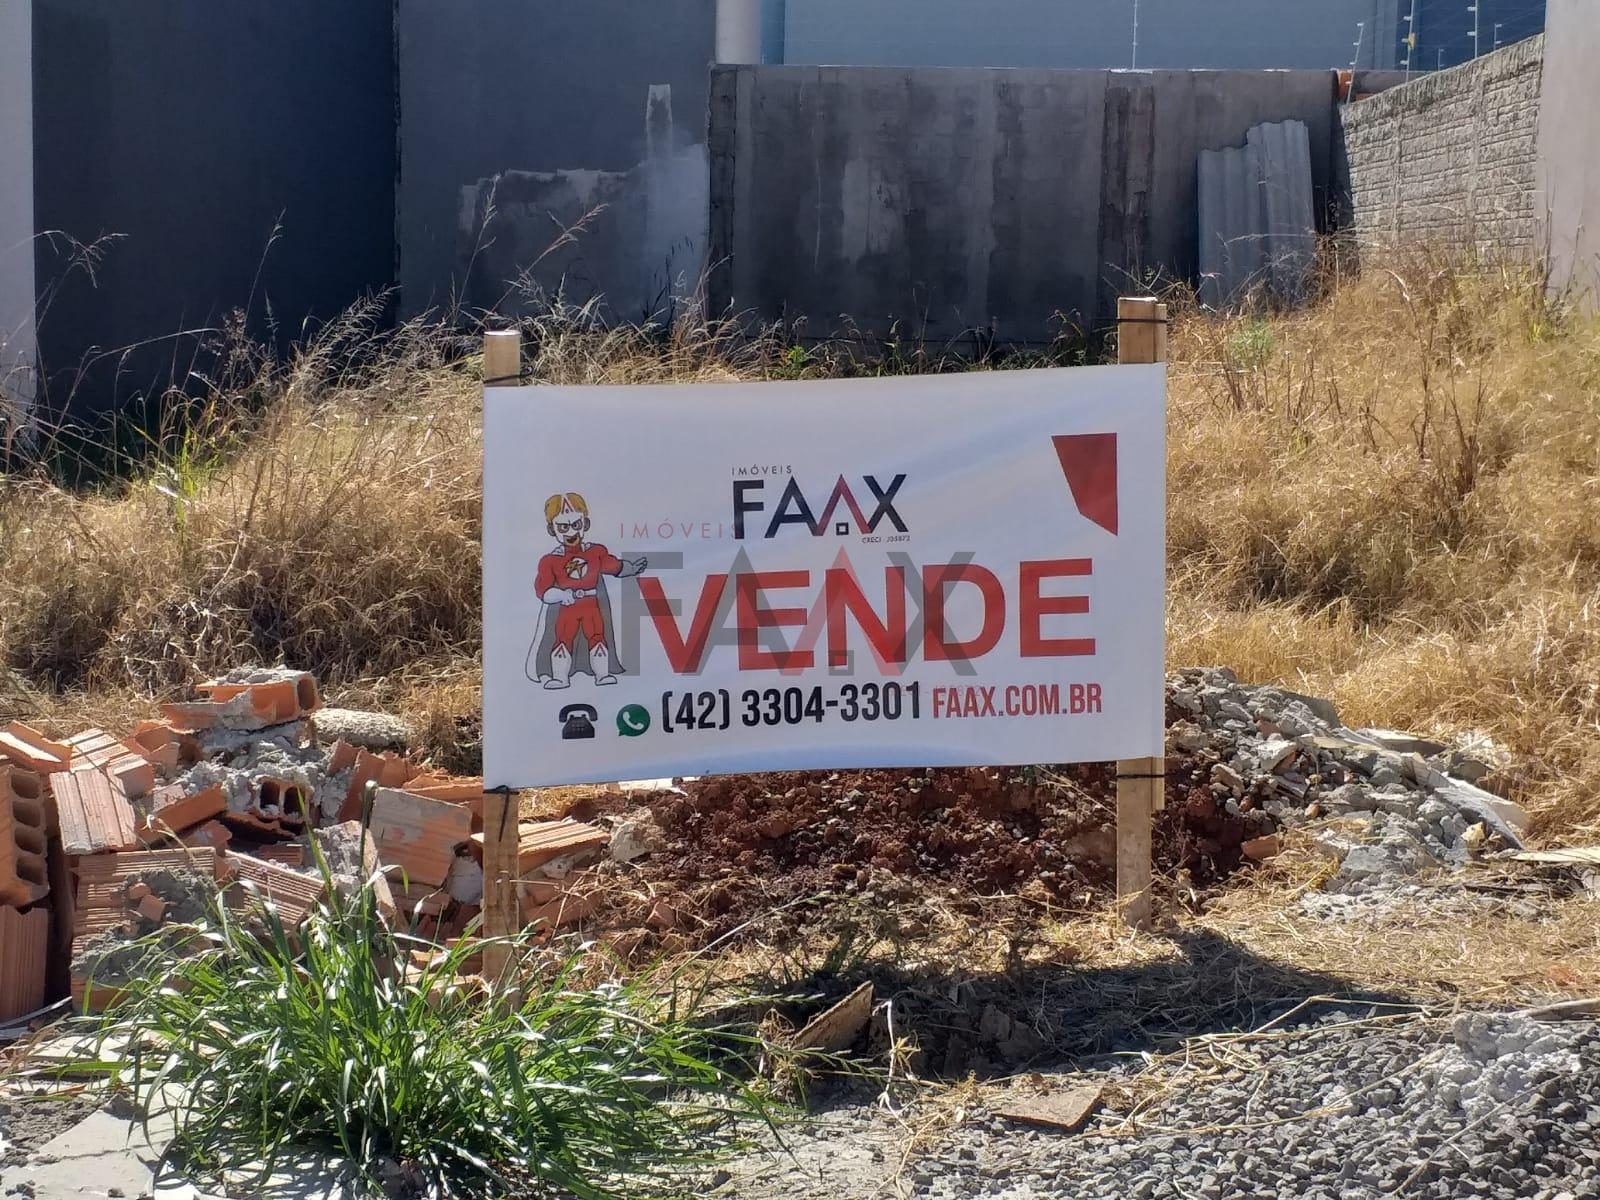 Terreno à venda, medindo 153,14m² em GUARAPUAVA - PR